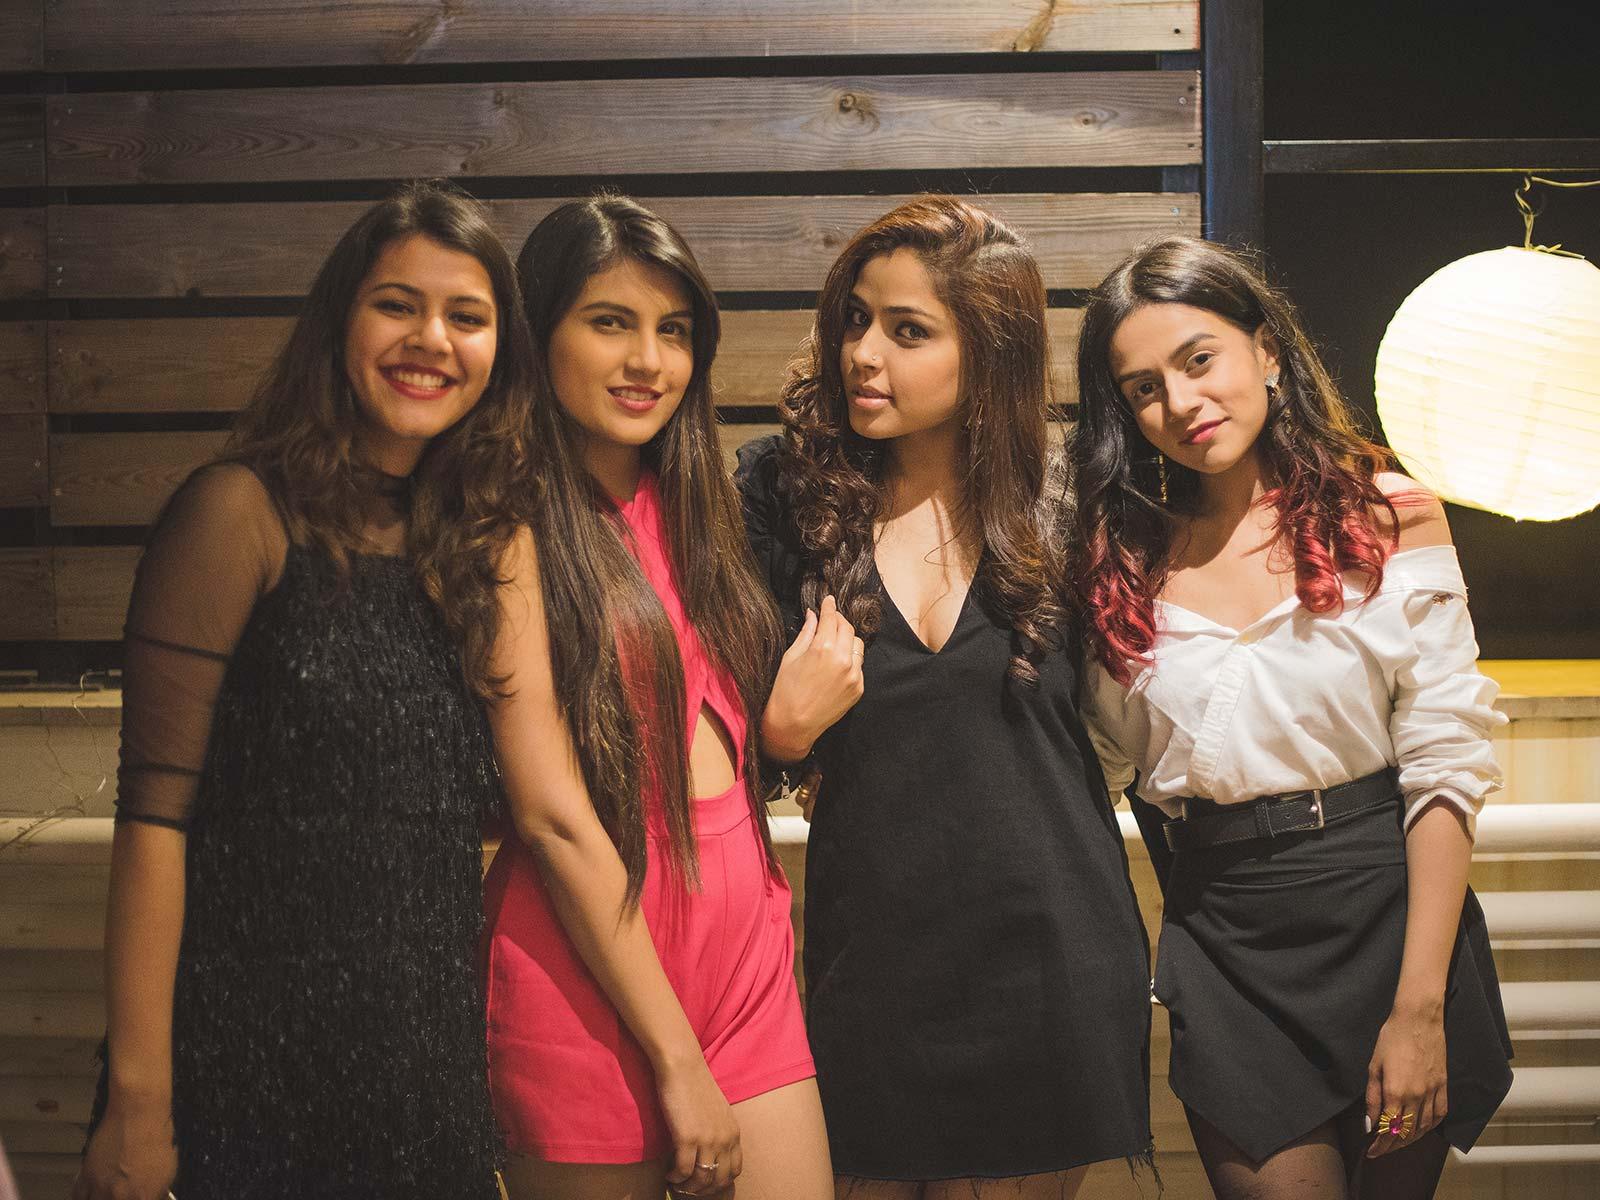 Cherry Jain, Gayatri Chhetry and Komal Pandey at the #POPxoTuns3 party